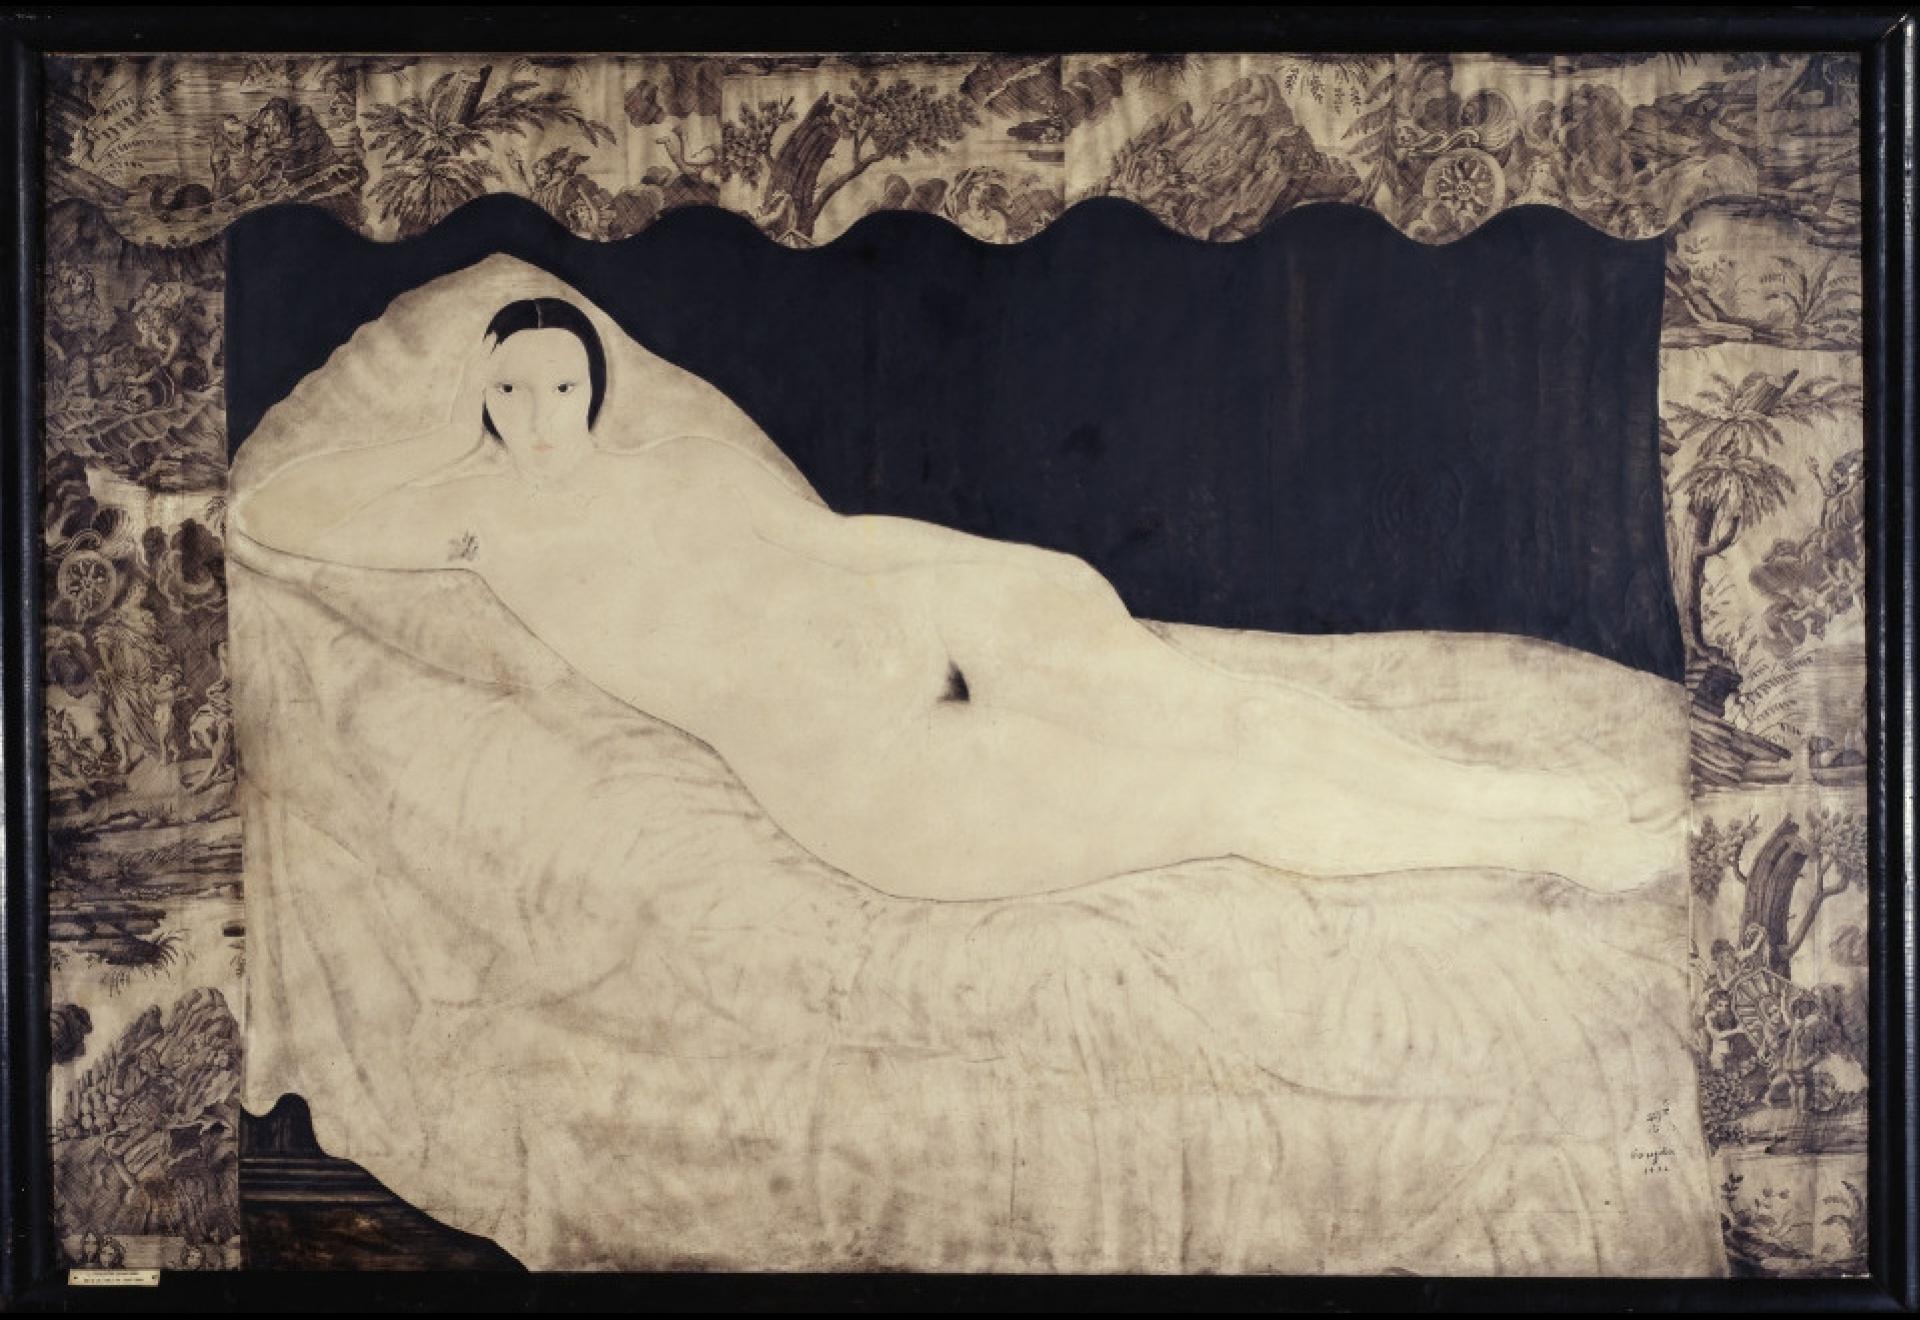 Tsuguharu Foujita (Léonard Fujita). Reclining Nude (the Nude Portrait of Kiki)